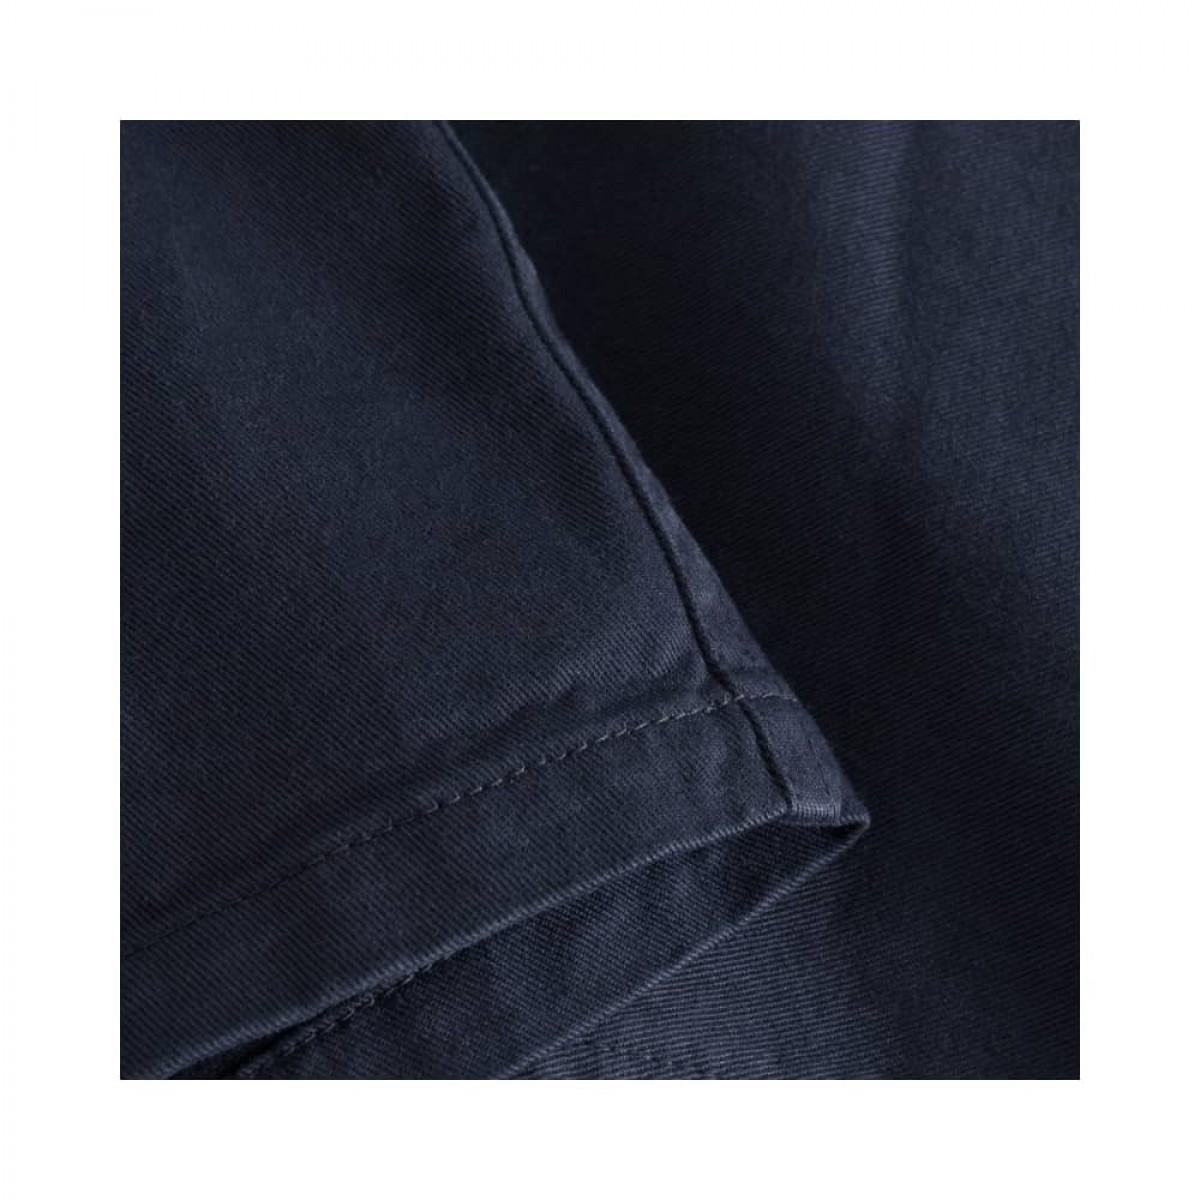 cady workwear jakke - navy - ærme det